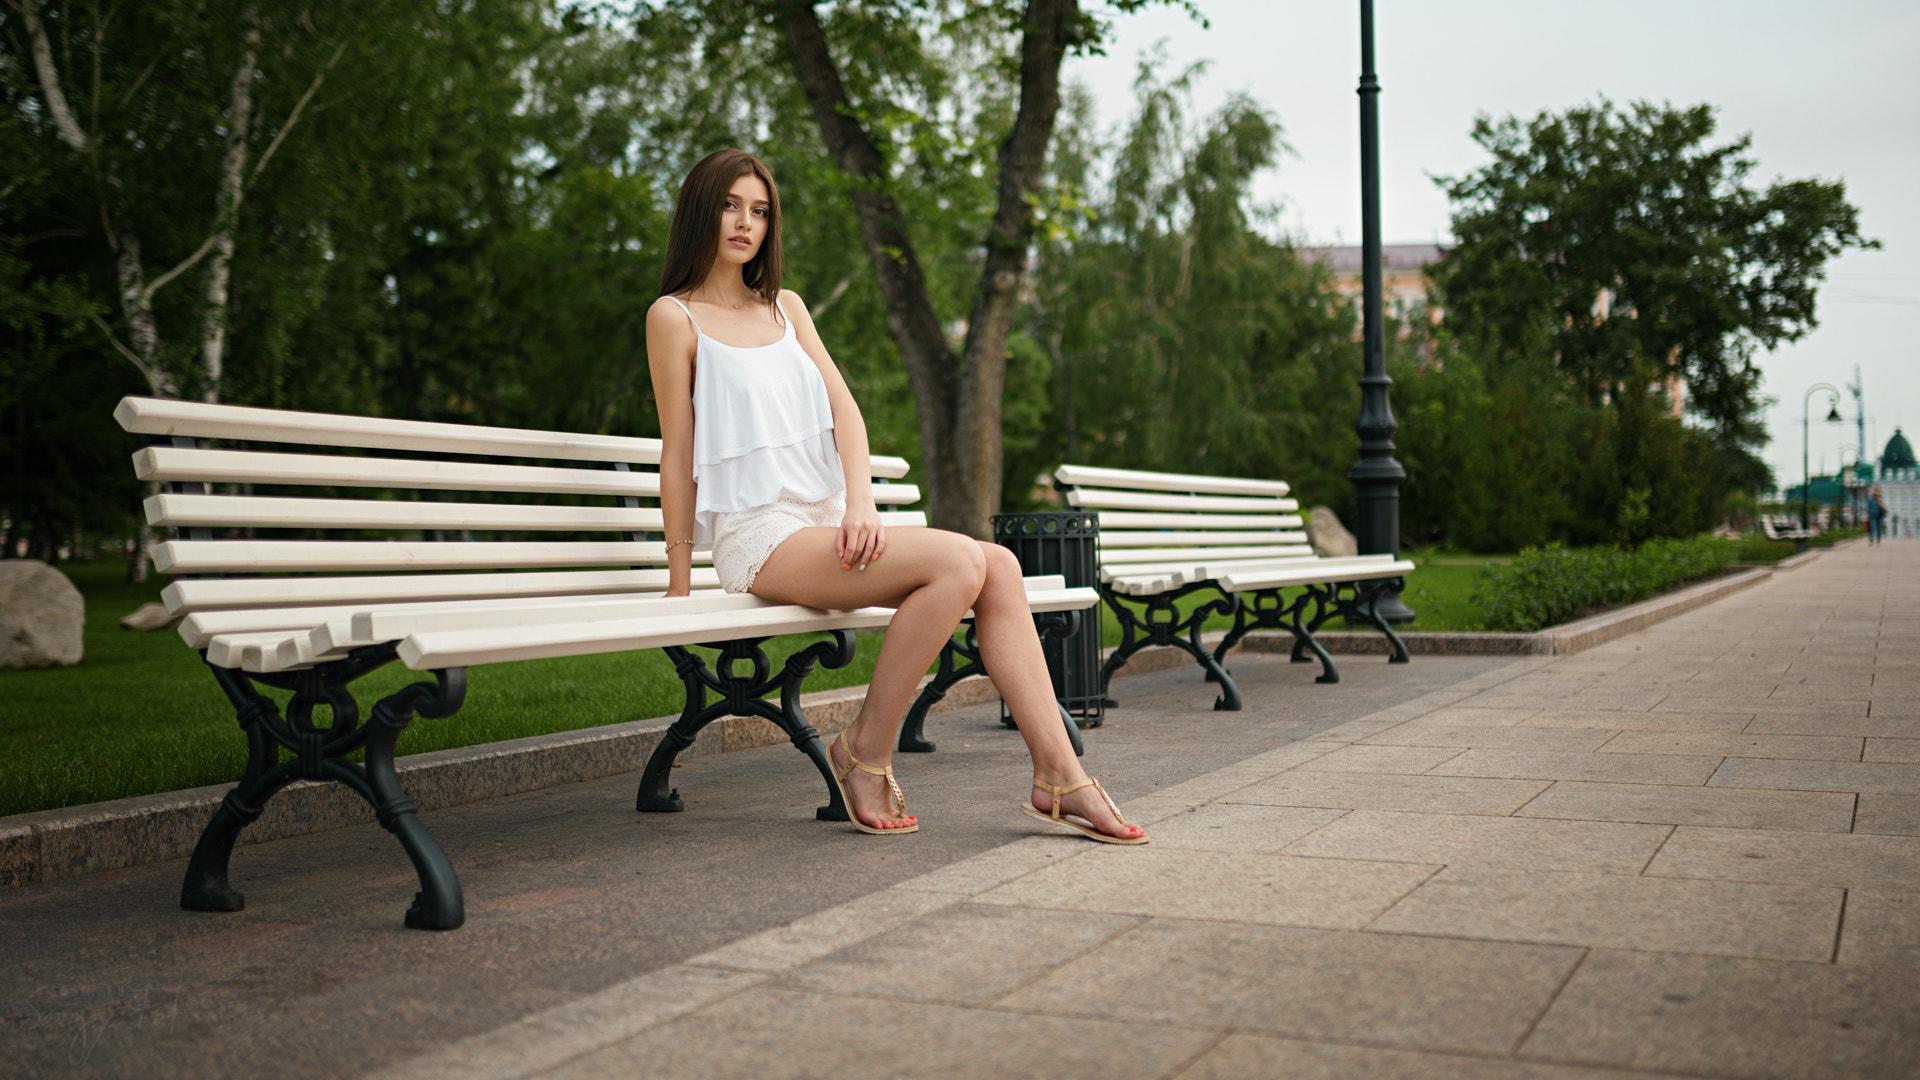 People 1920x1080 women model women outdoors urban Sergey Fat bench park sitting on bench Anastasija Algazina legs